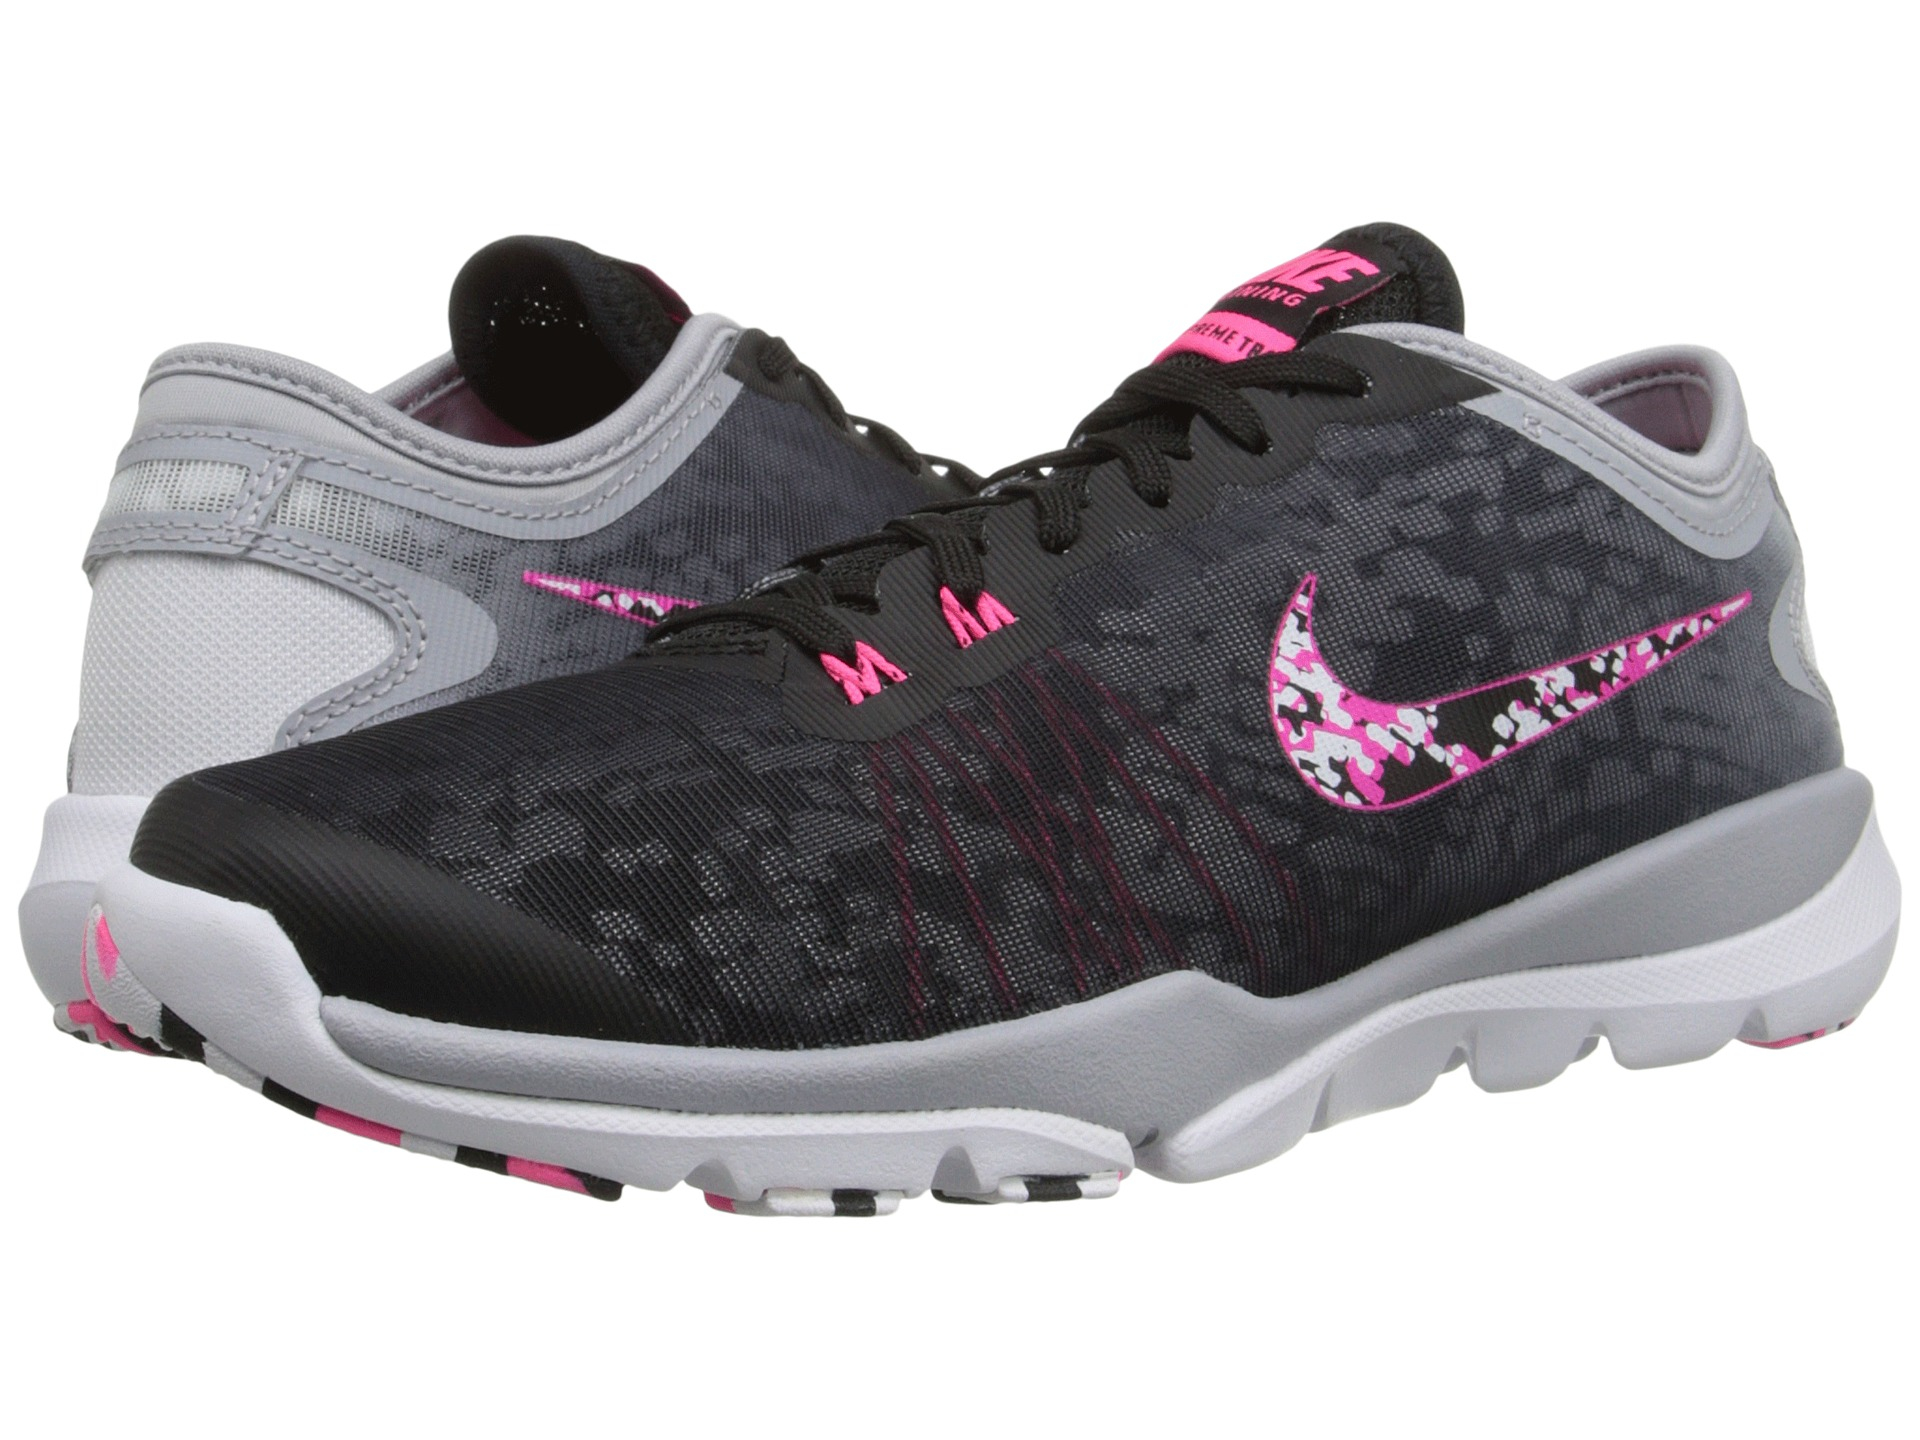 c51a5373ce16 ... Womens Cross Training Shoe - Black  Lyst - Nike Flex Supreme Tr 4 Pr in  Black ...